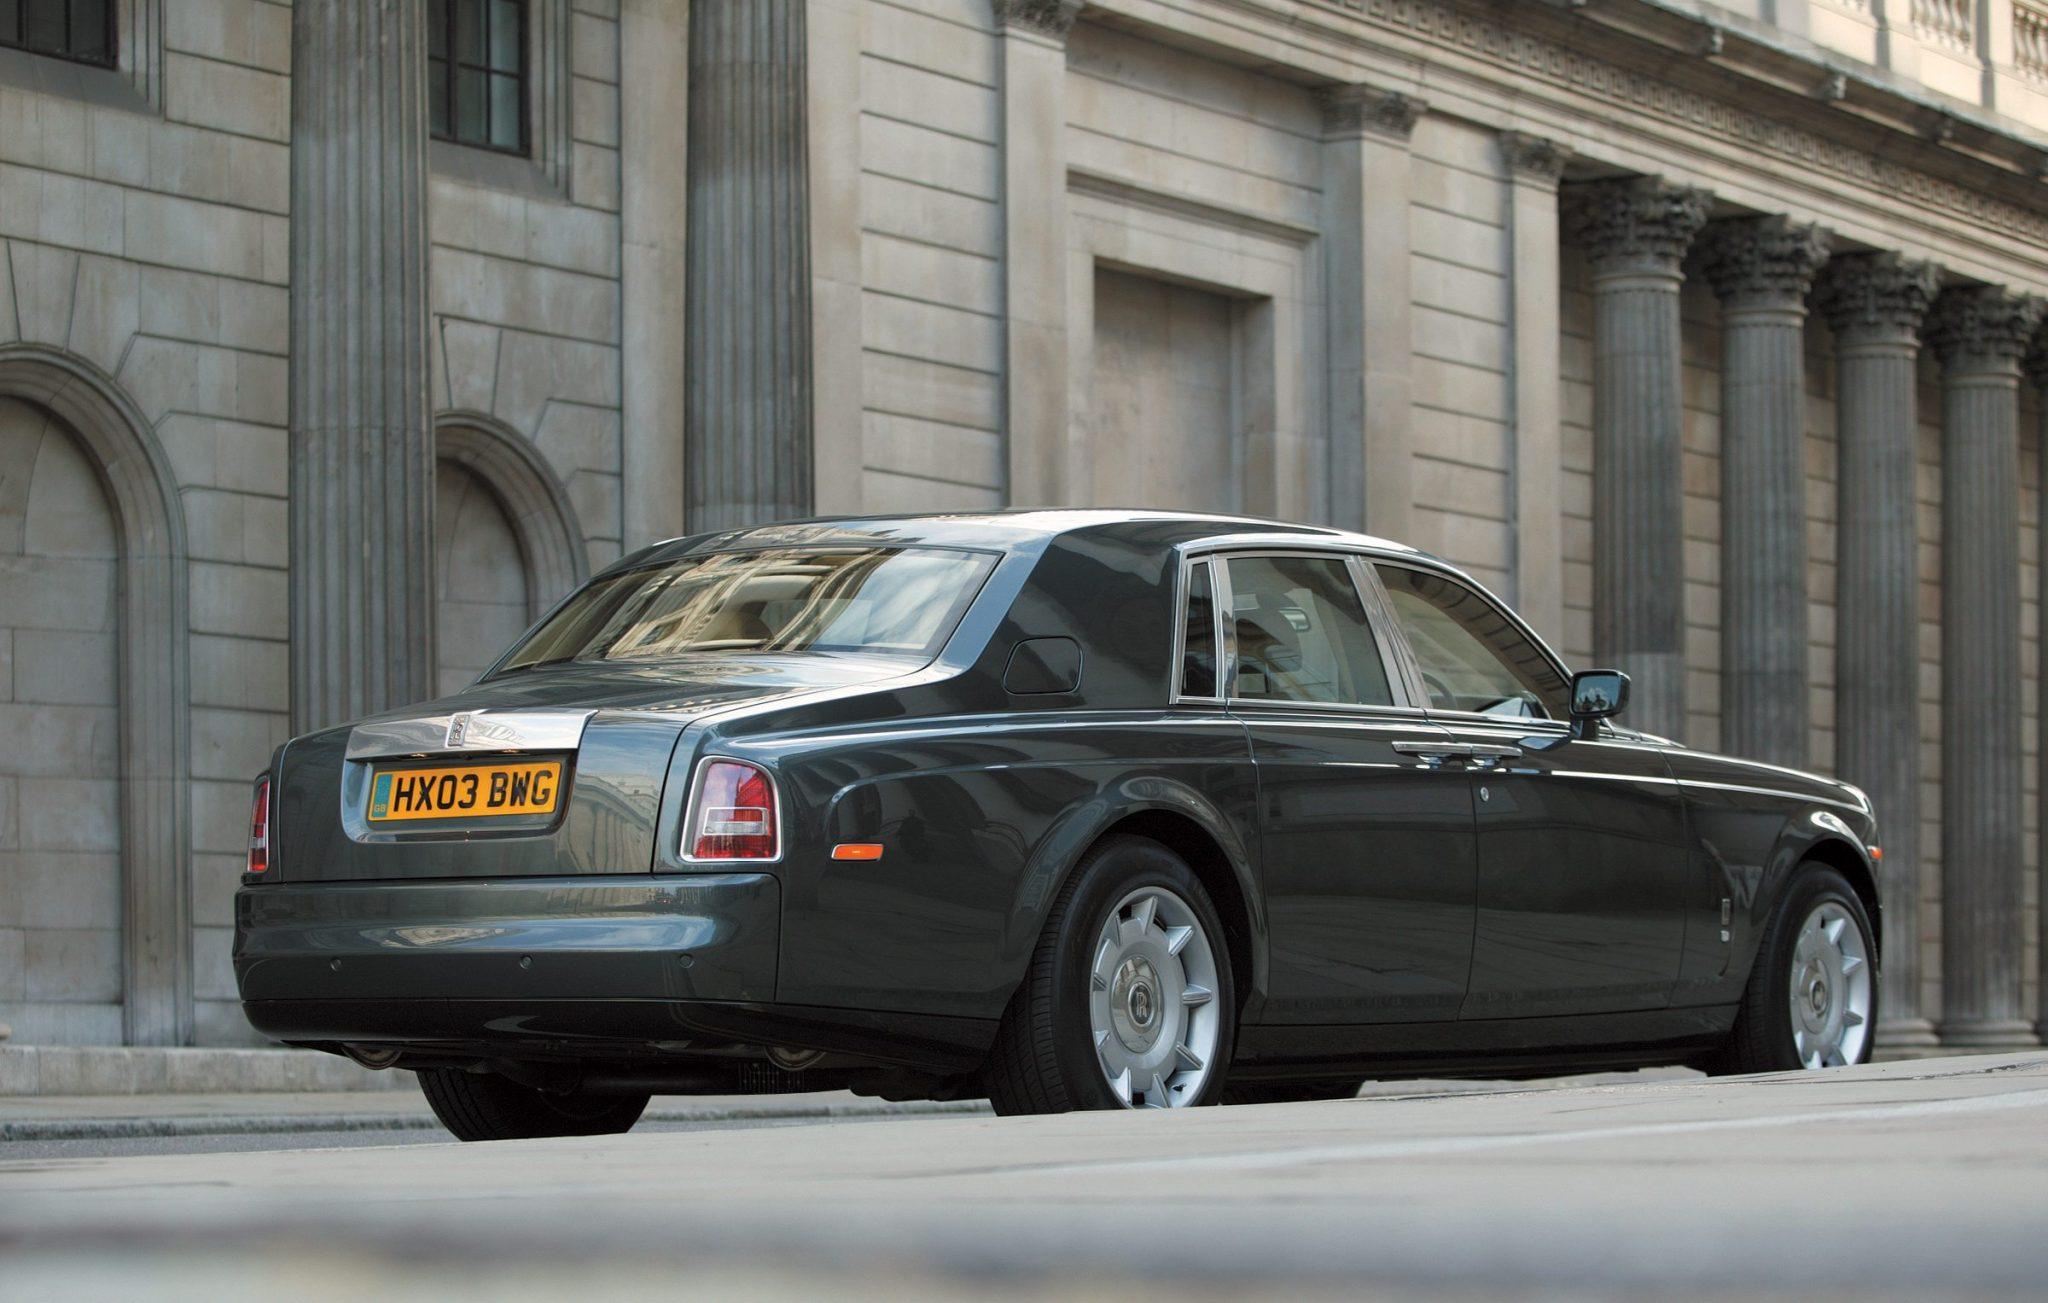 2004 Rolls-Royce Phantom Rear